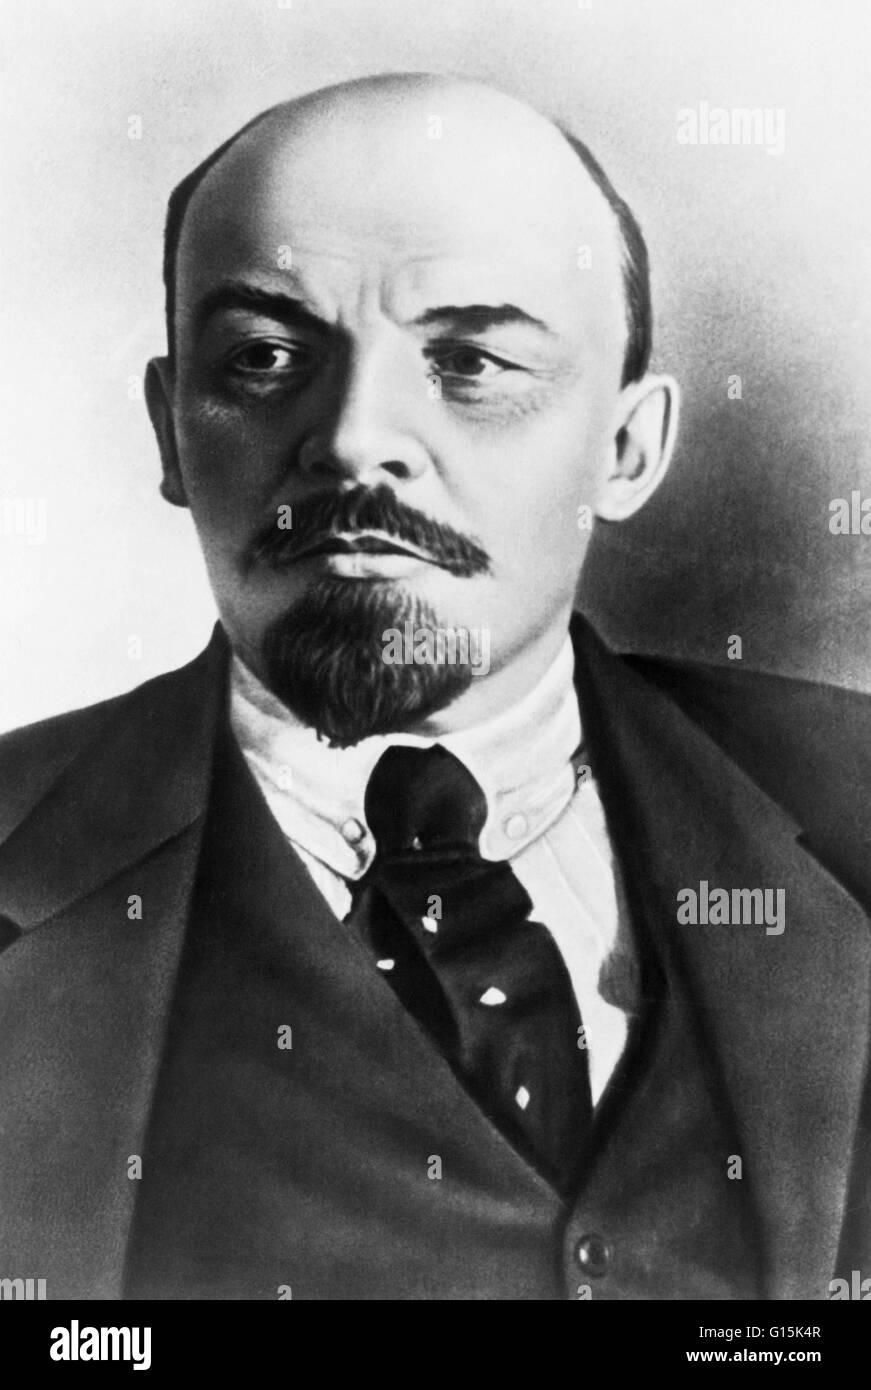 Vladimir Ilyich Lenin (April 22, 1870 - January 21, 1924) was a Russian Marxist revolutionary, communist politician, - Stock Image